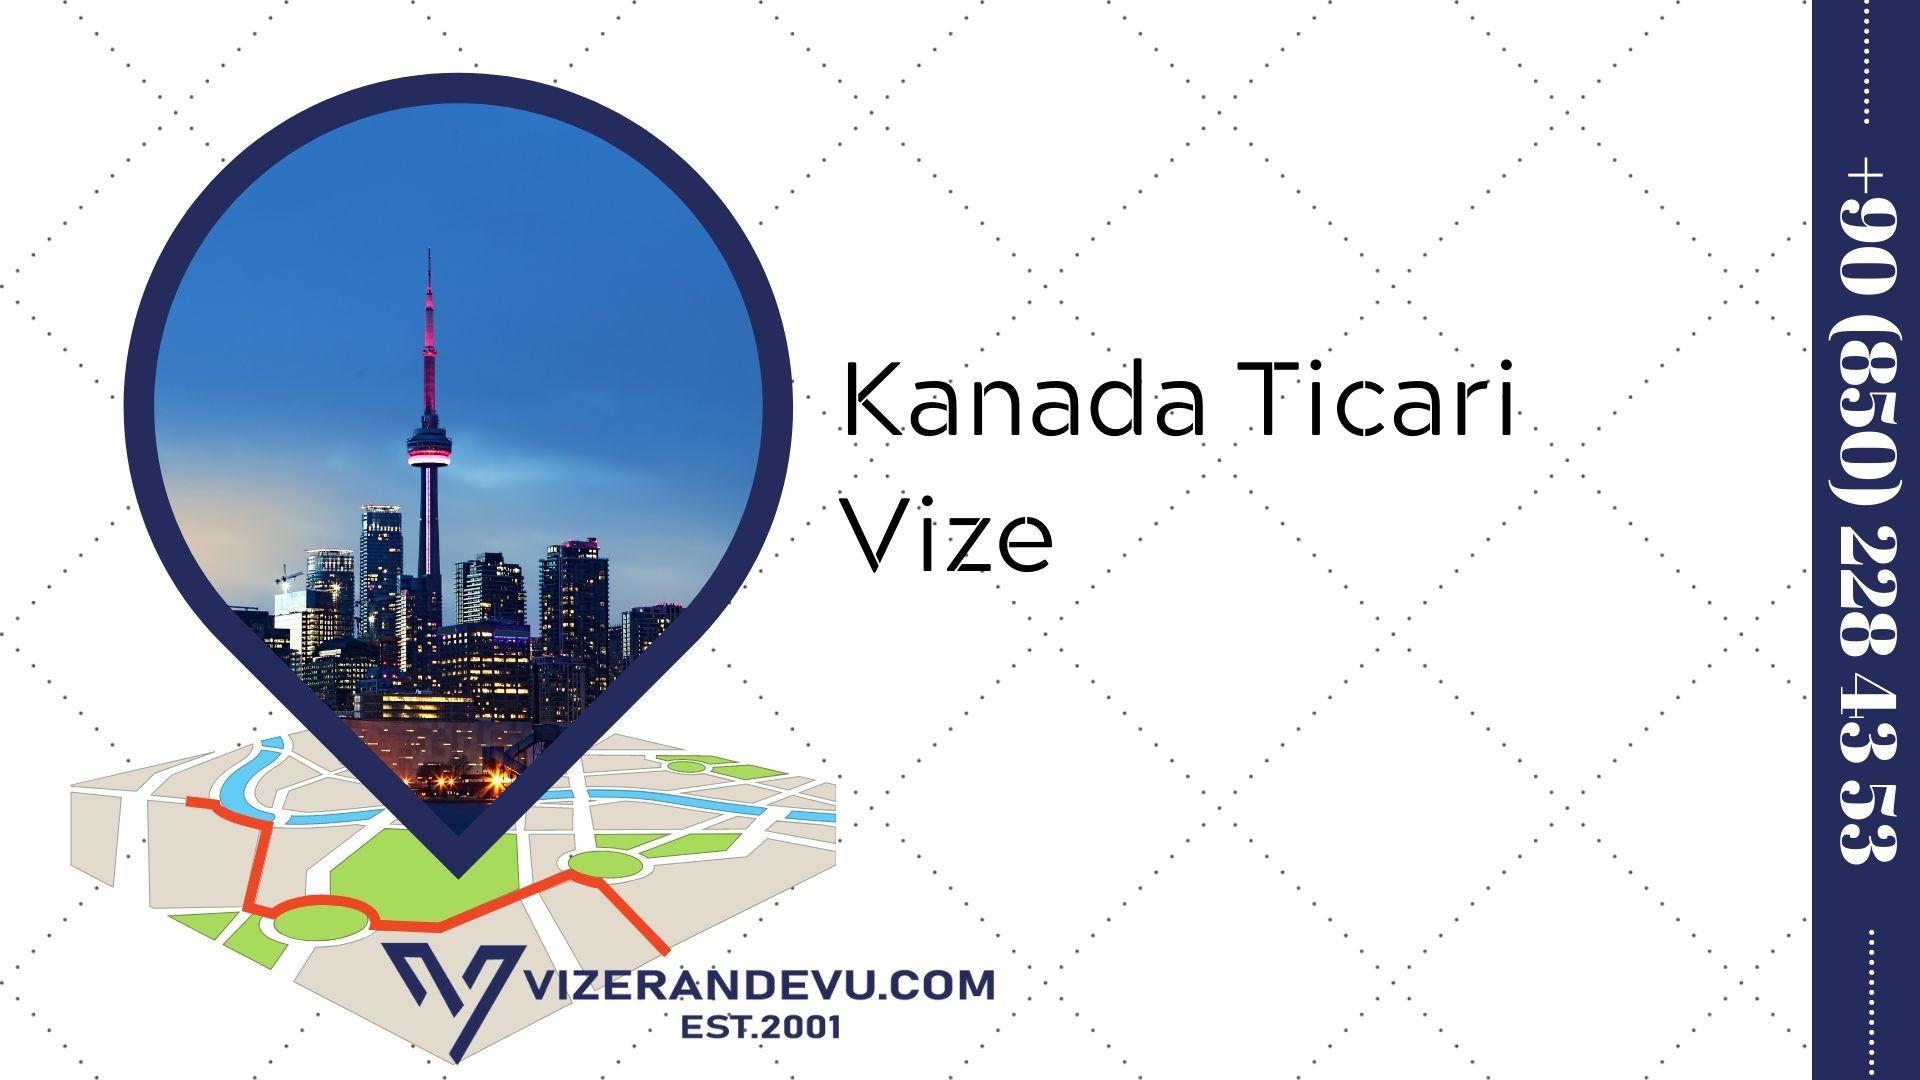 Kanada Ticari Vize